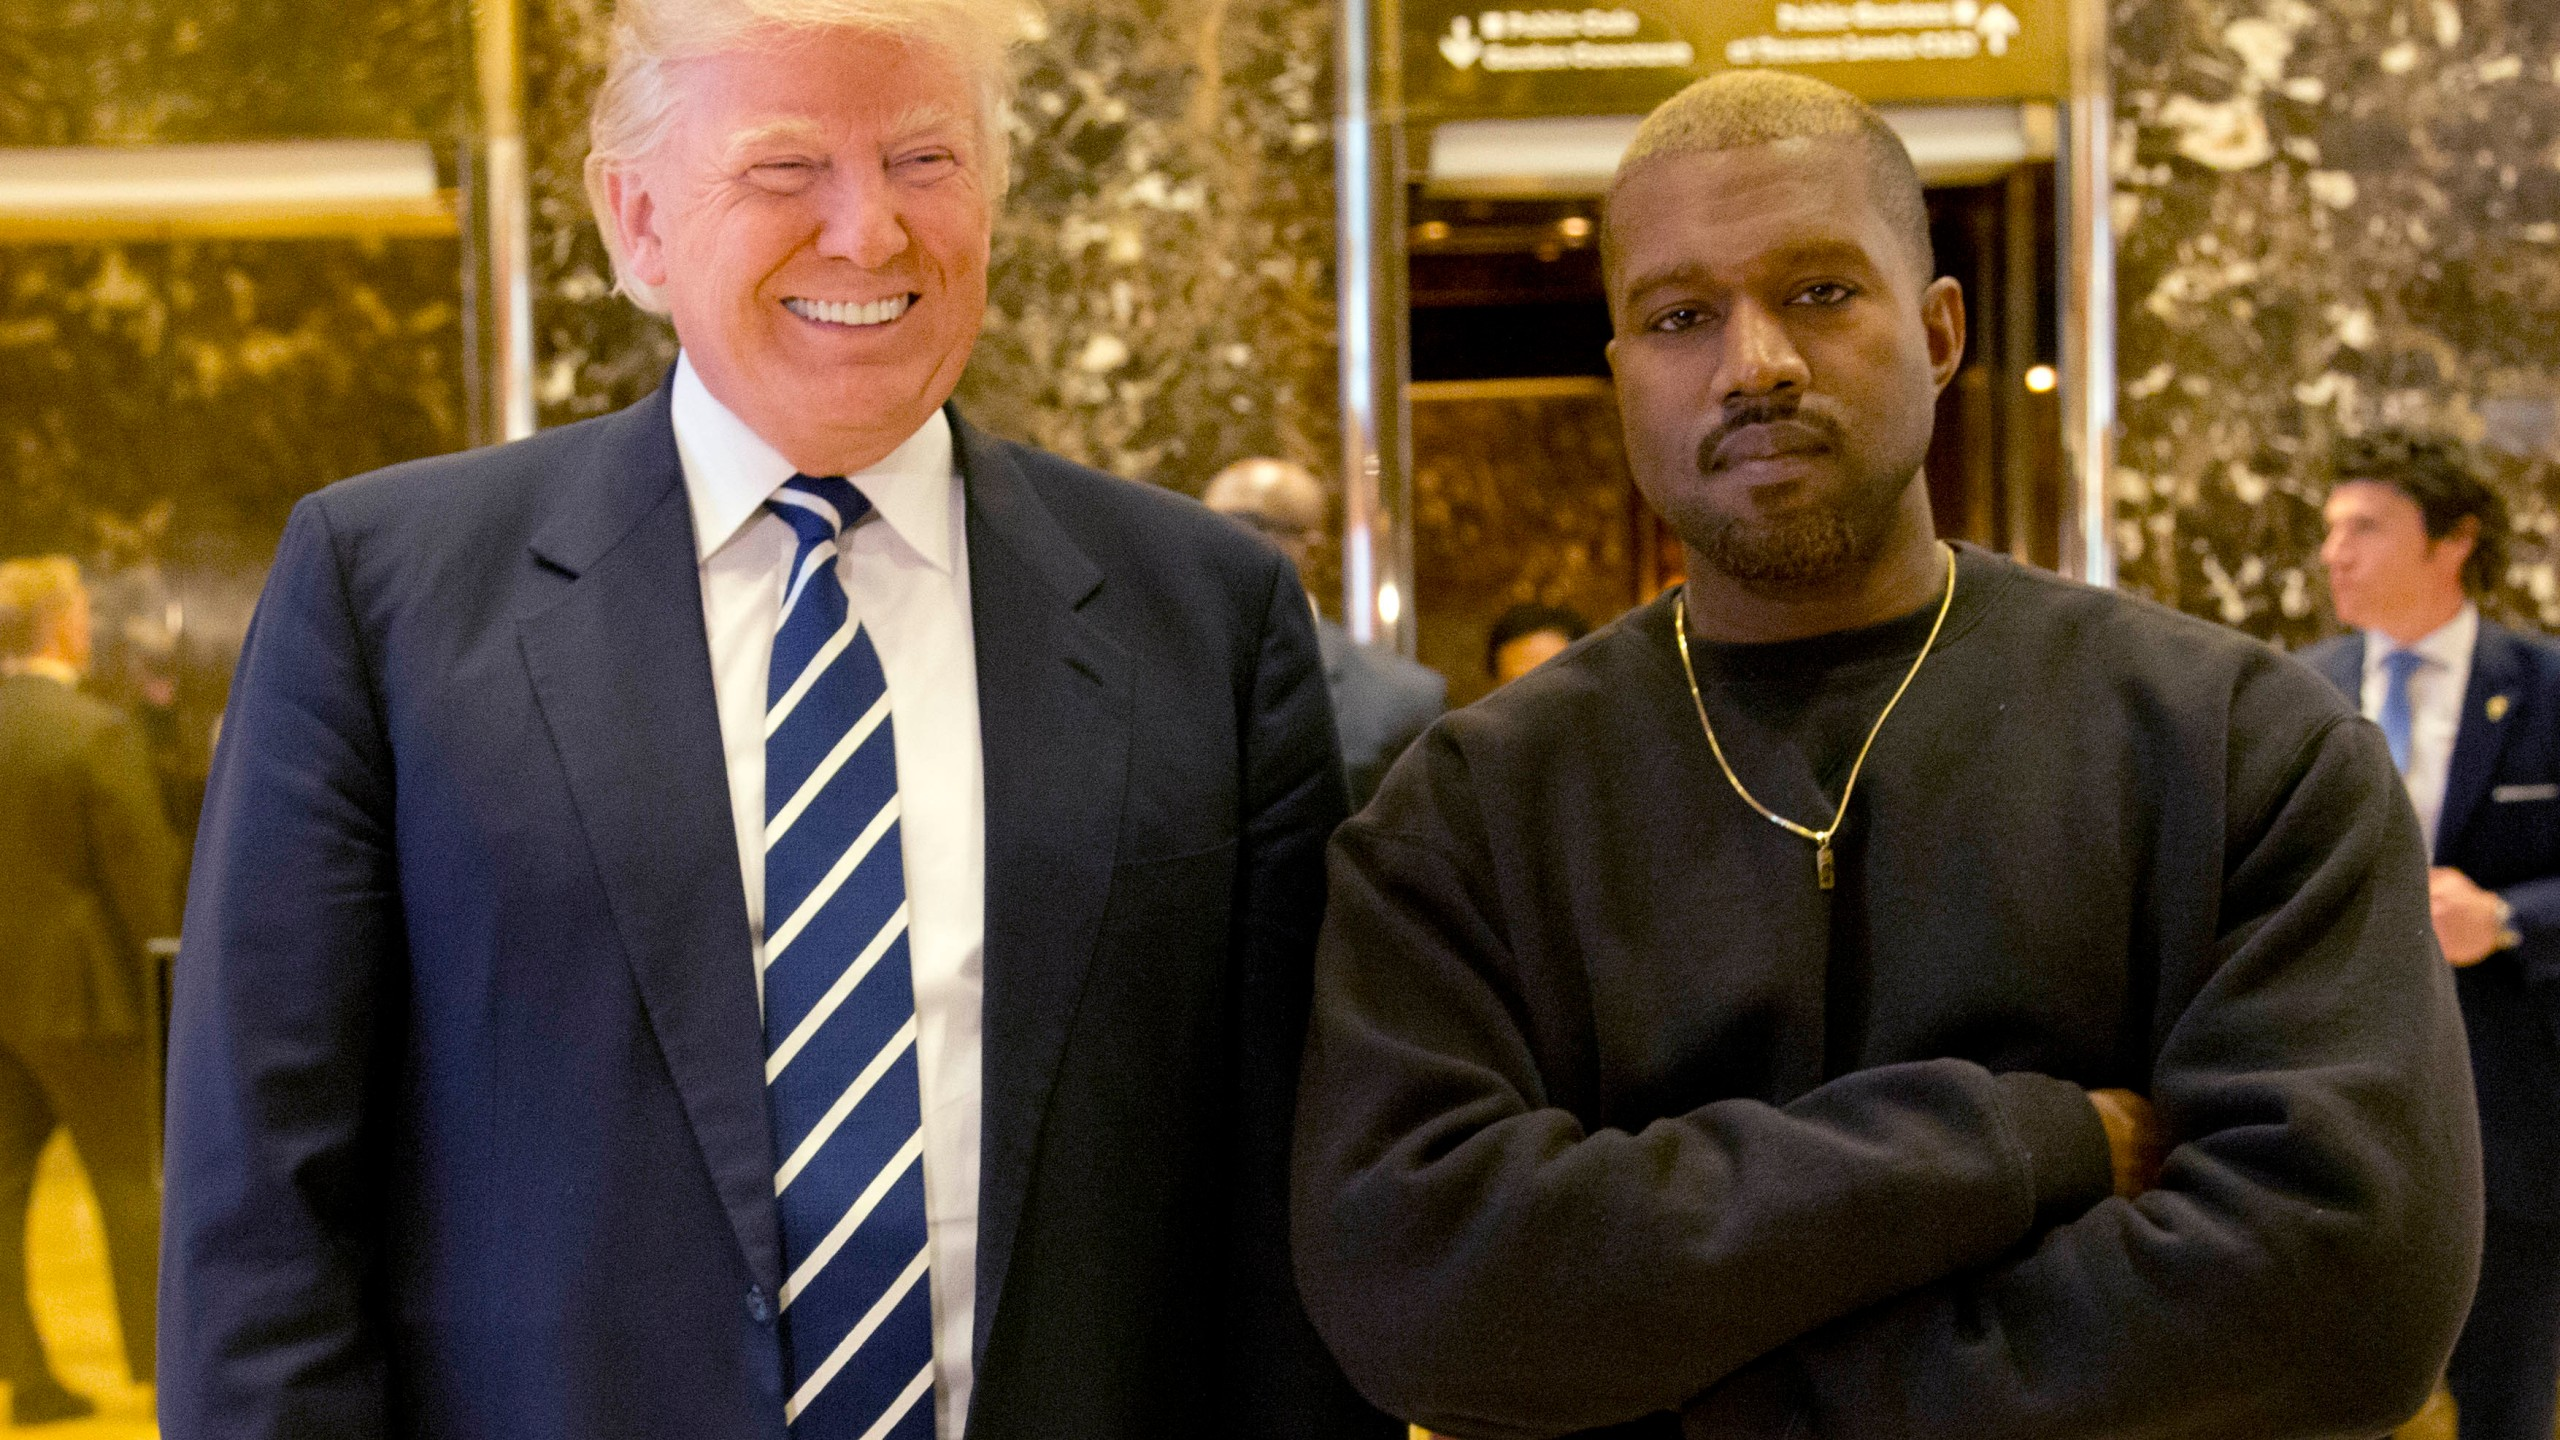 Trump_Kanye_West_17334-159532.jpg25358799